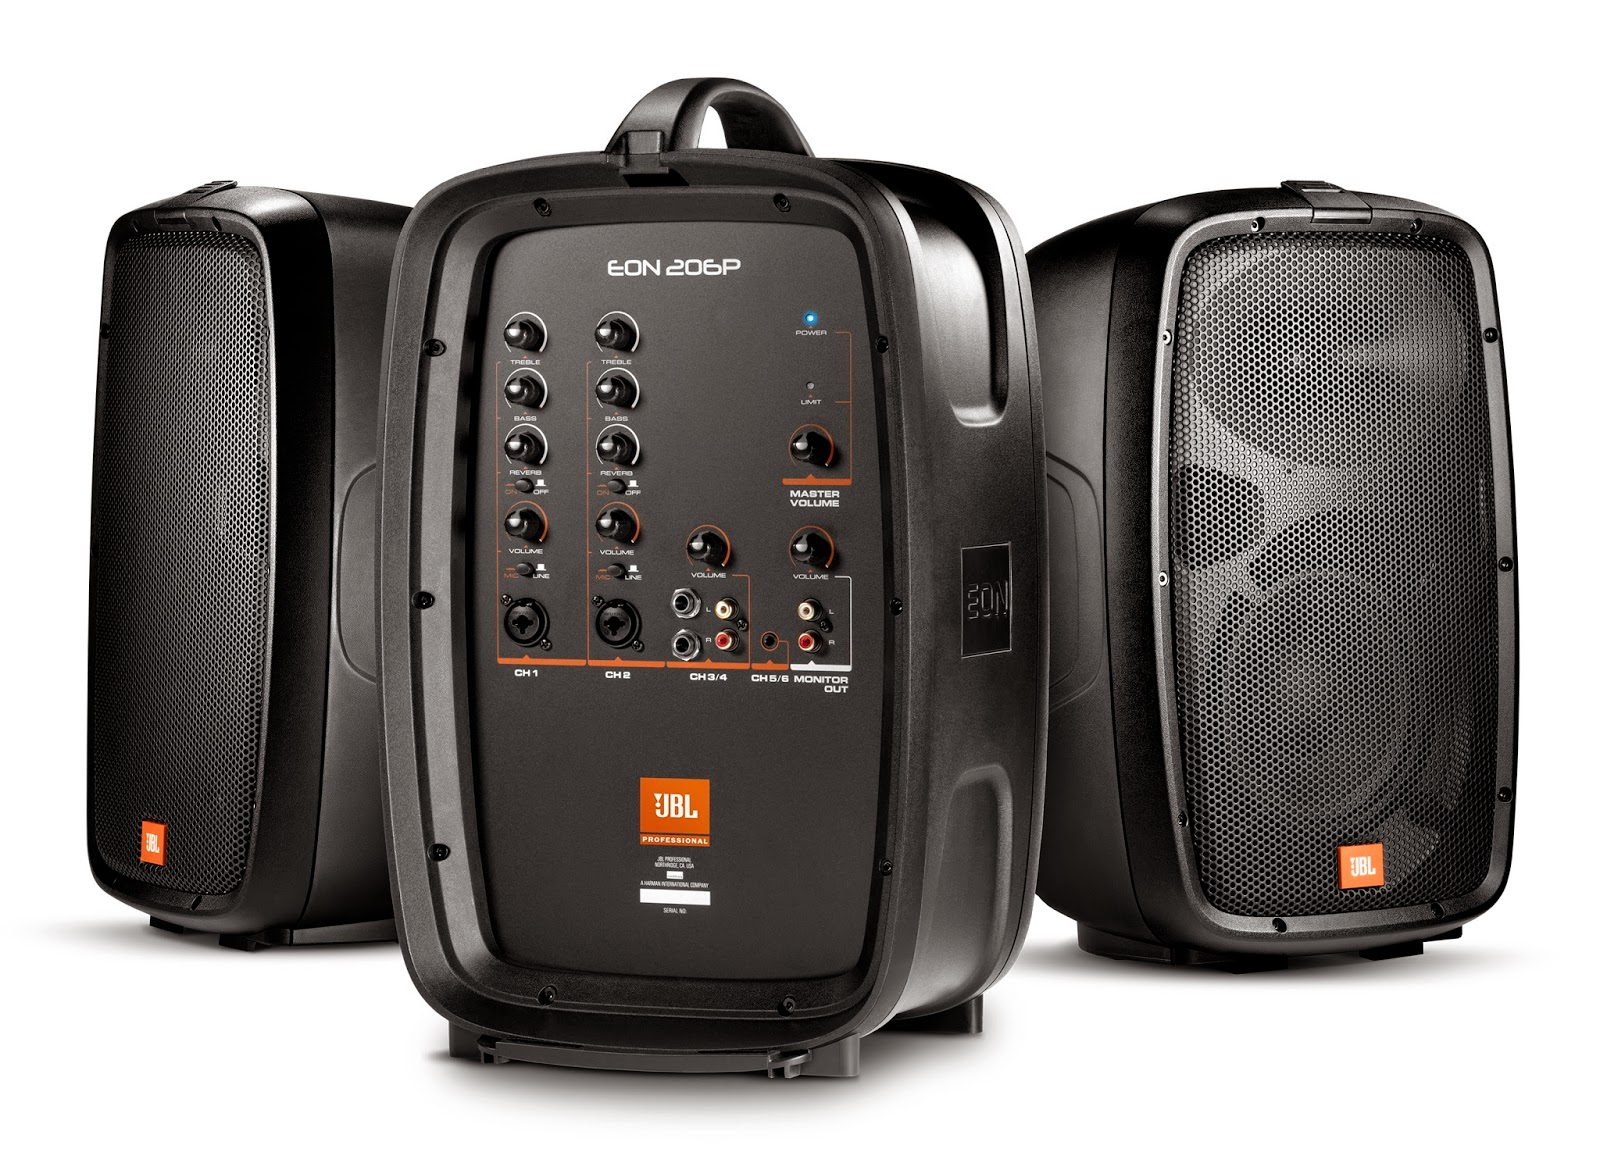 harman s jbl professional eon 206p portable pa system. Black Bedroom Furniture Sets. Home Design Ideas